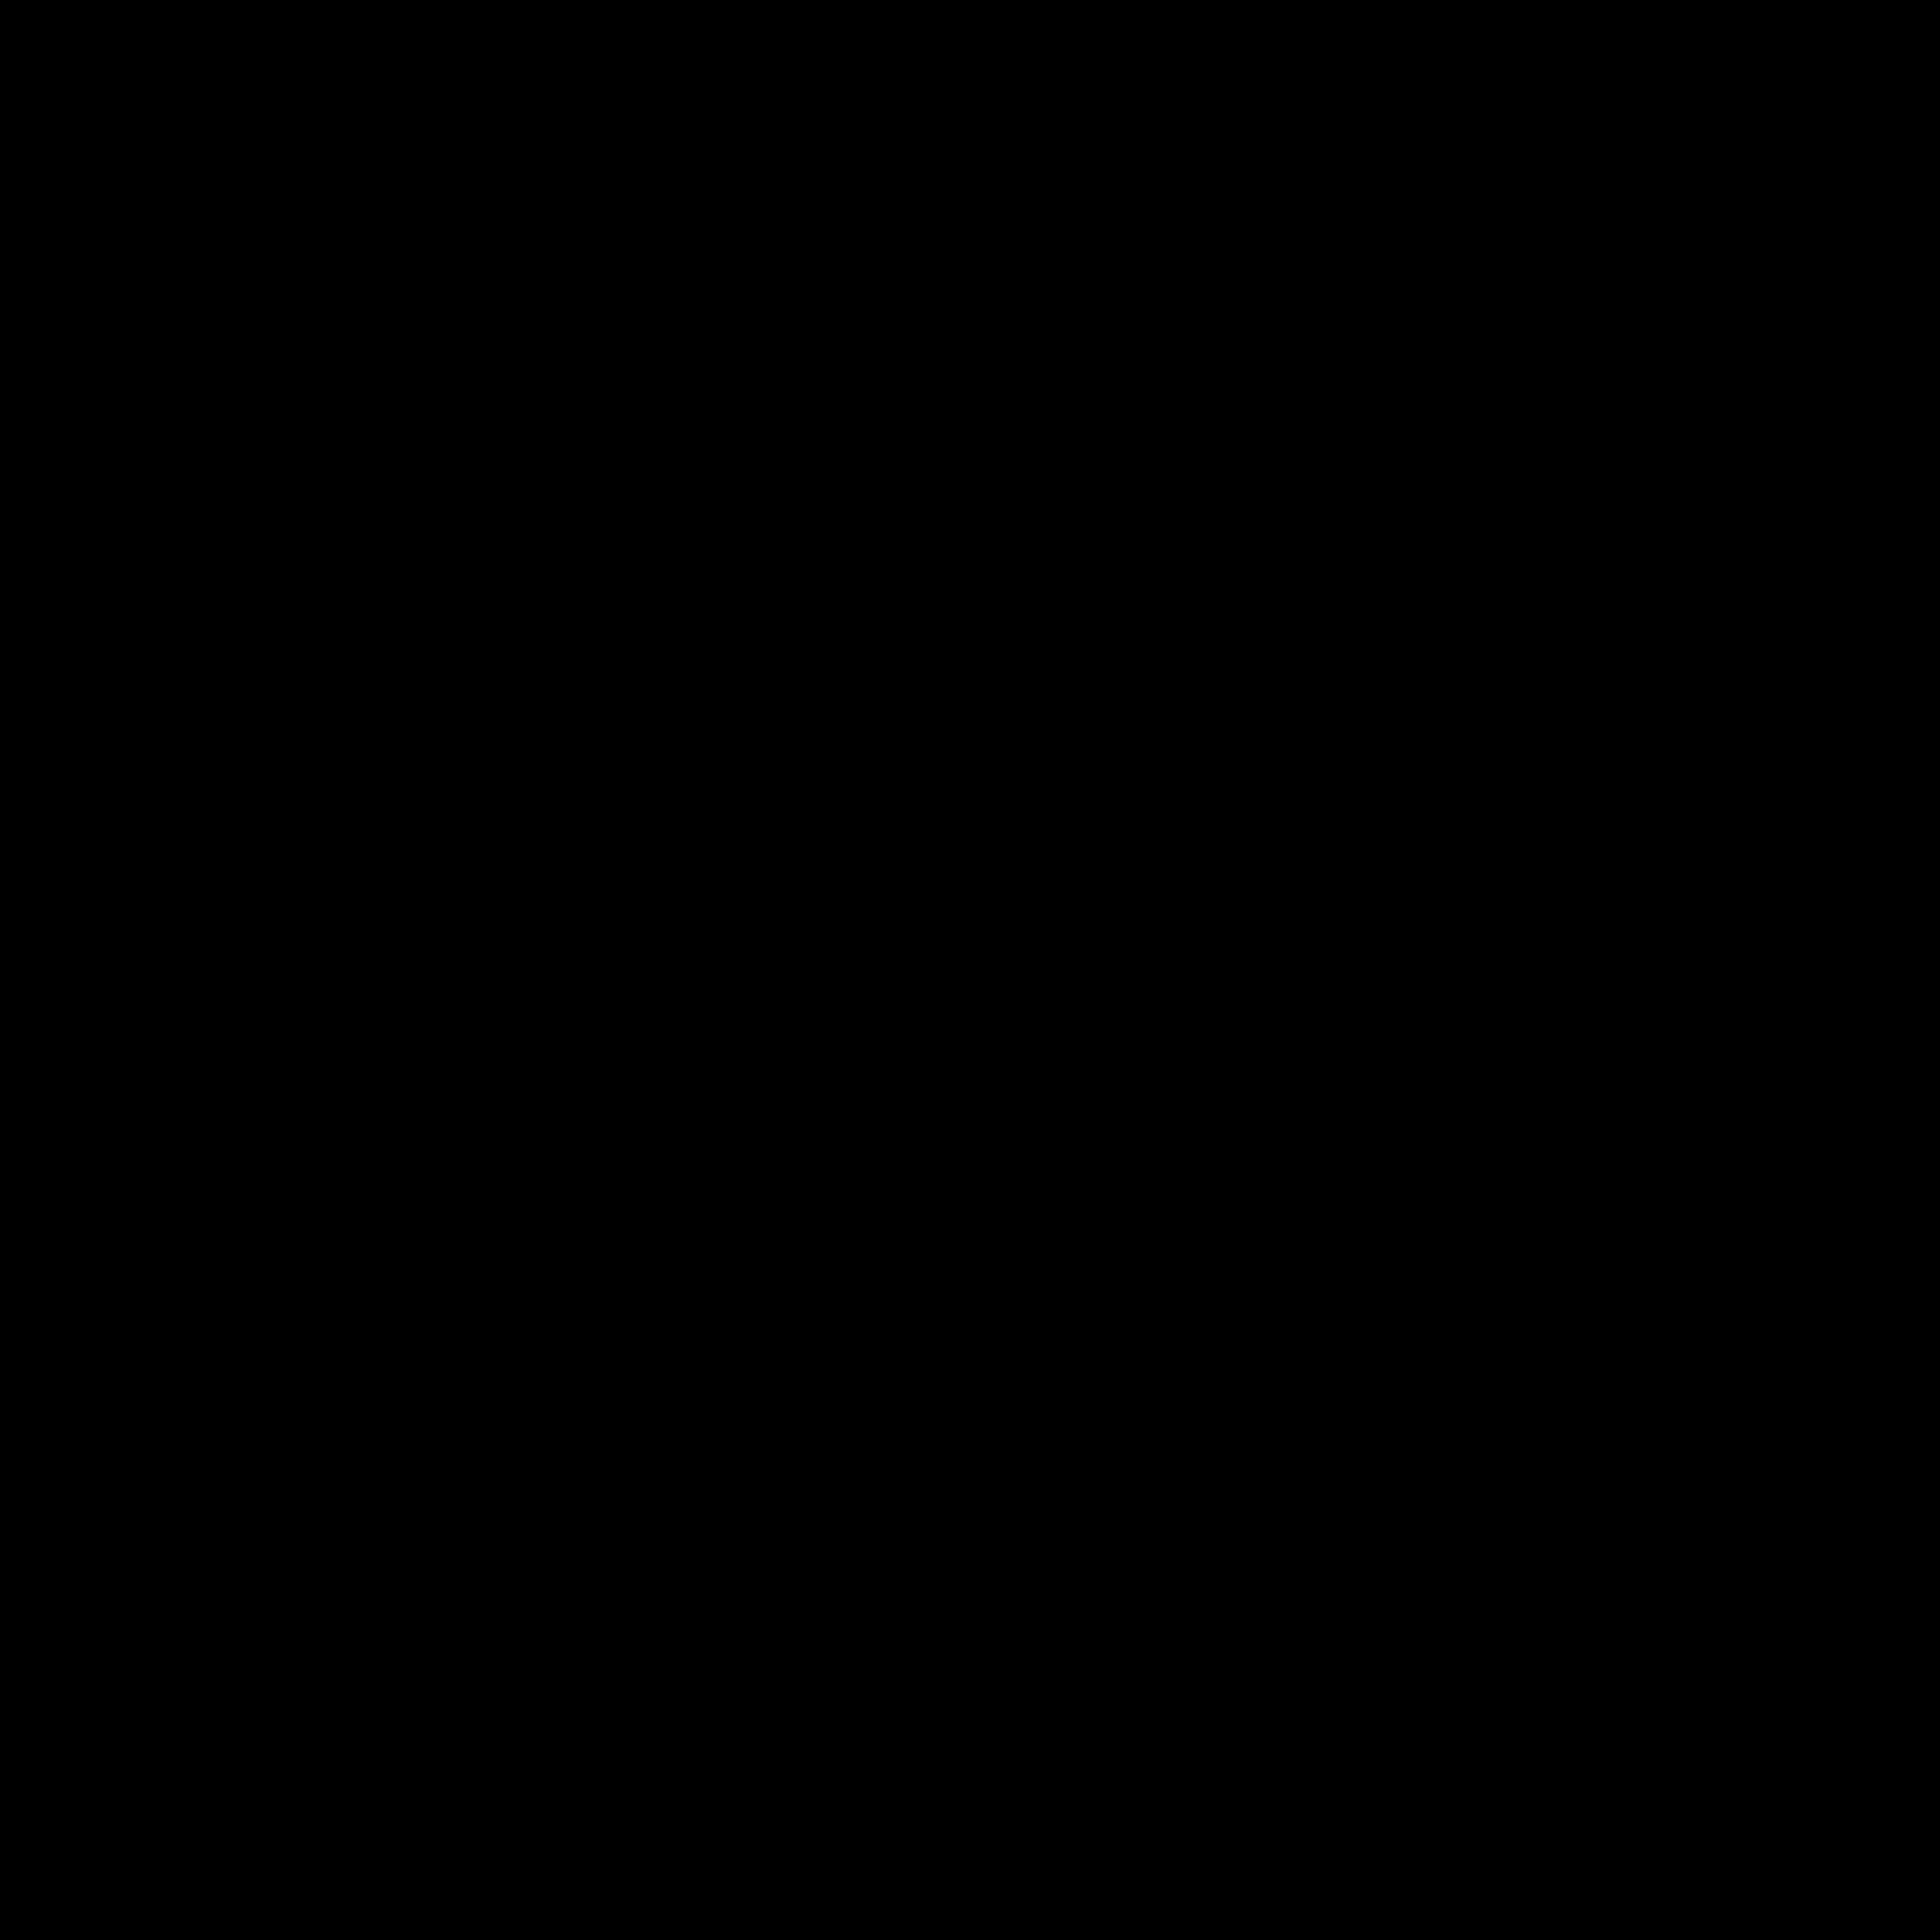 Dow Jones Logo Png Transparent Svg Vector Freebie Supply